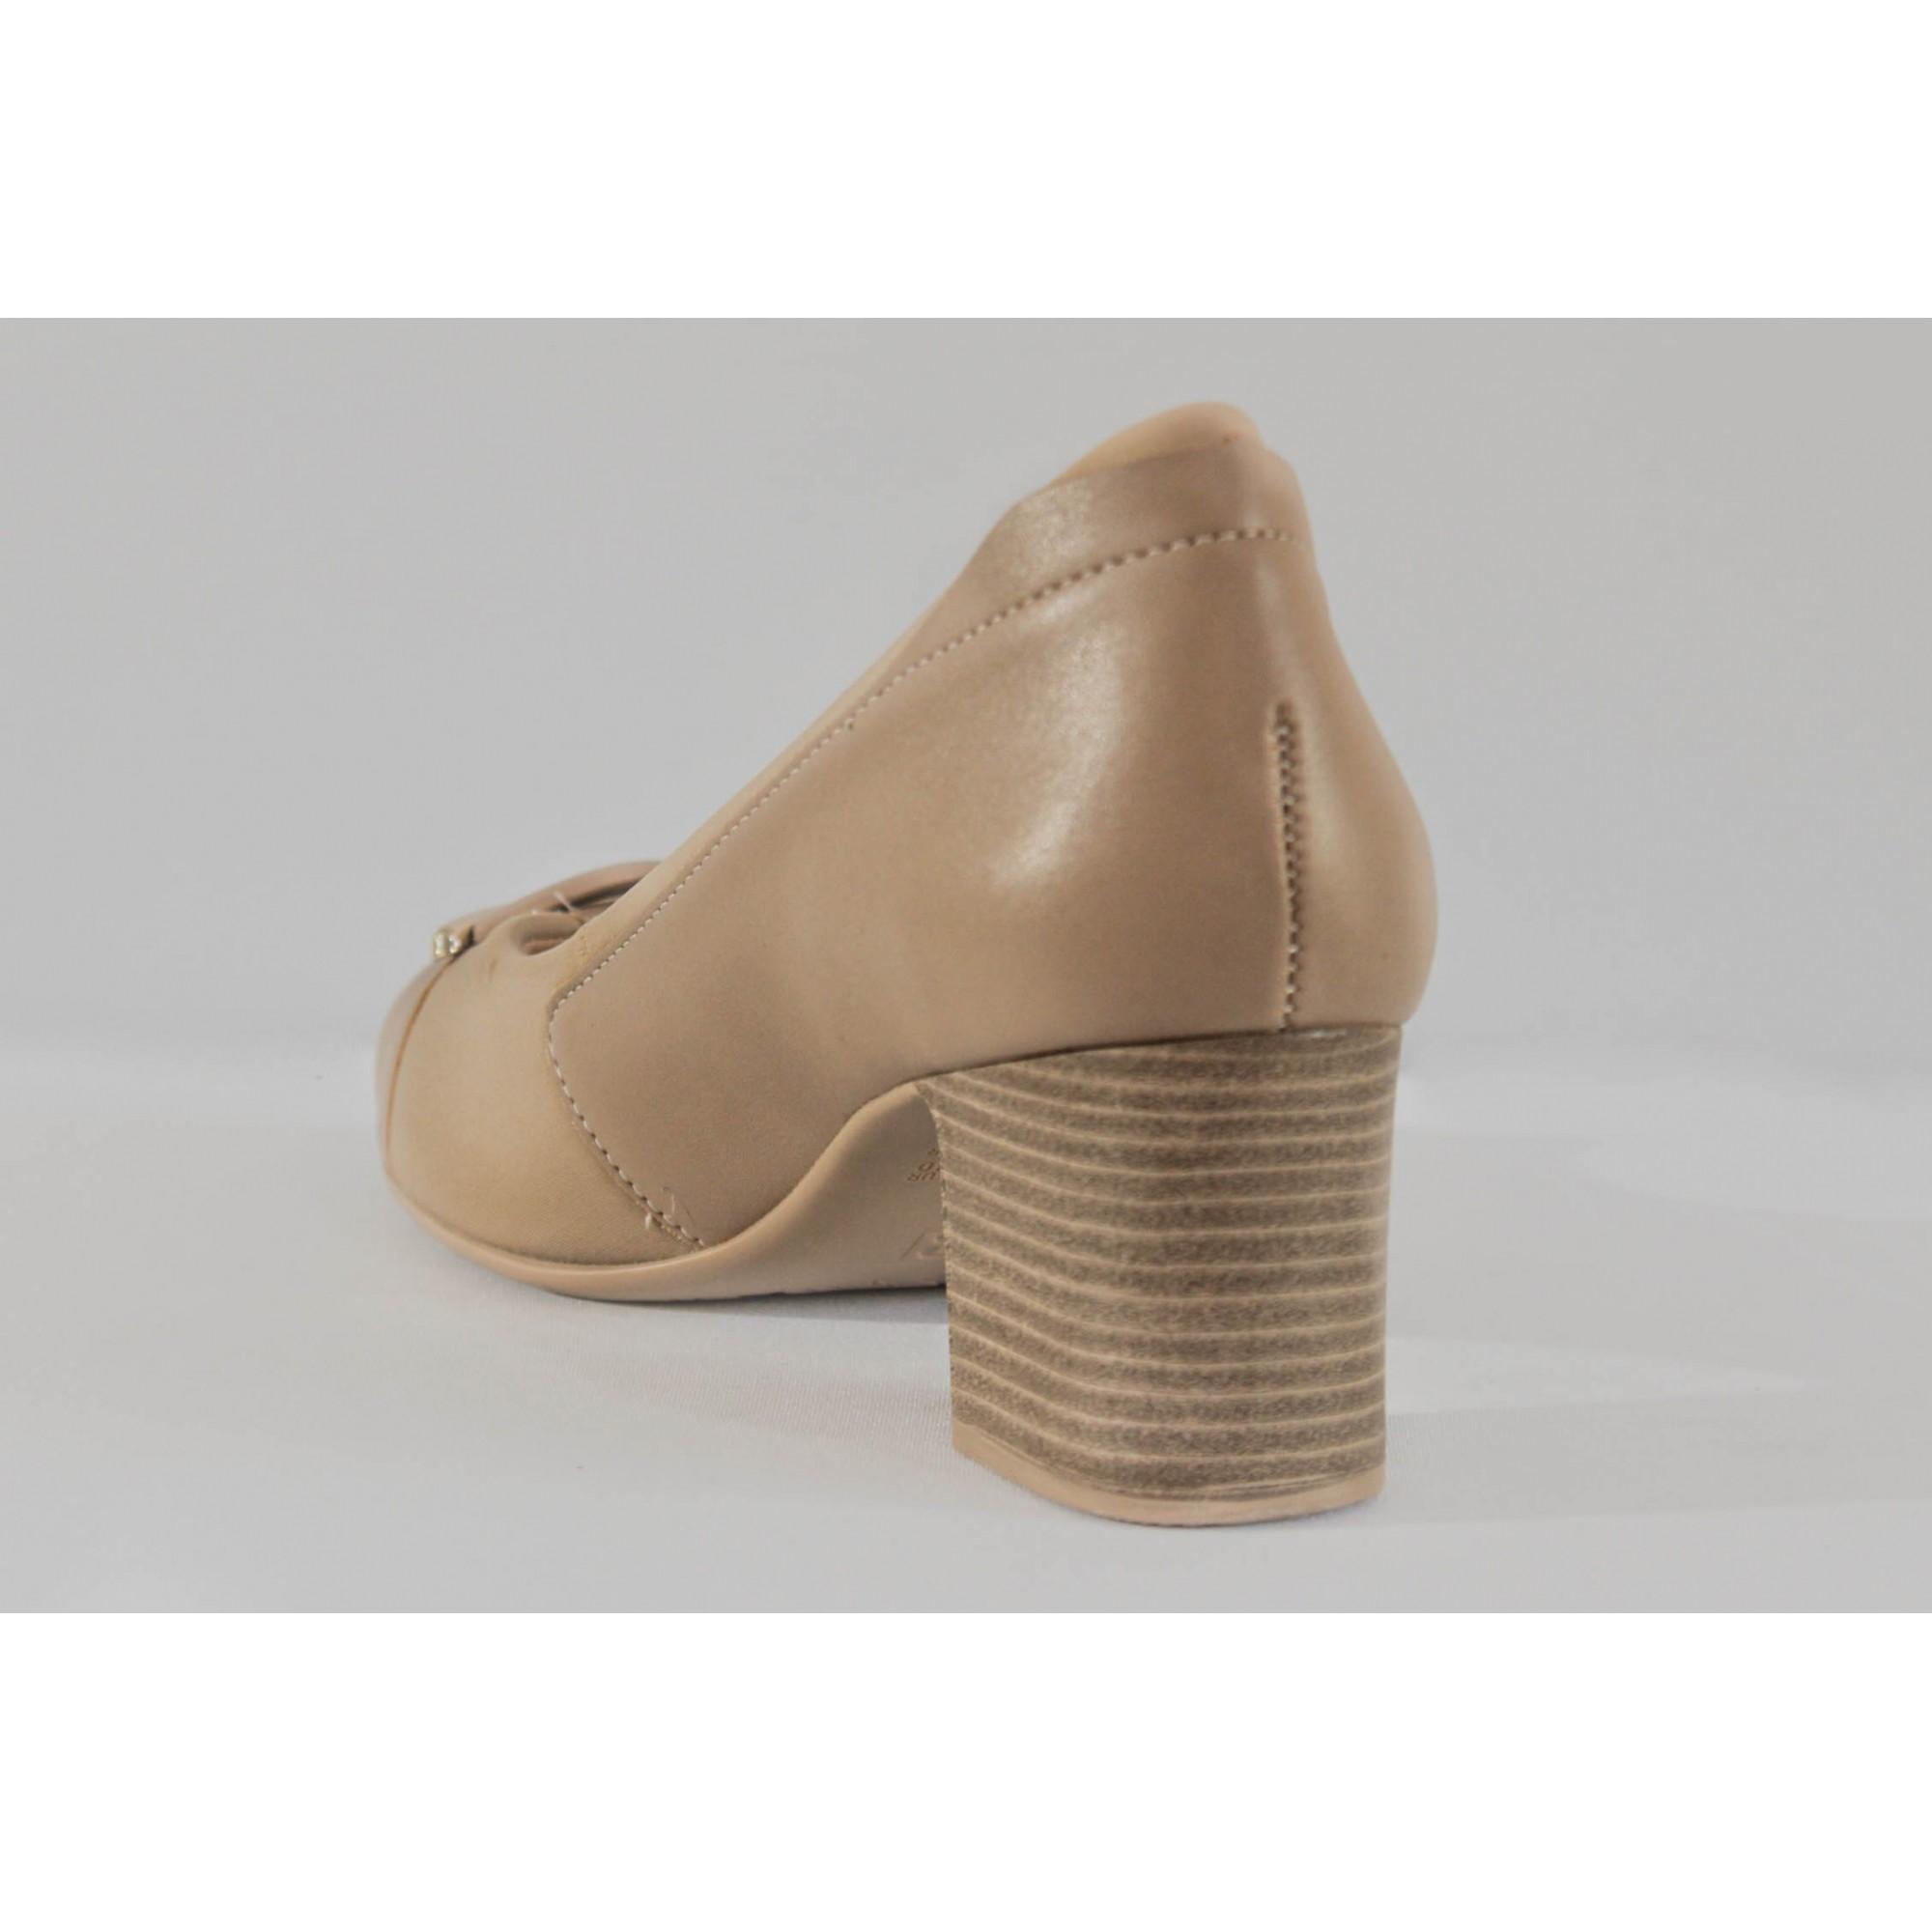 Sapato Confortflex Ref. 1954305 Napa Avela-Lycra Avela-Forro Nude